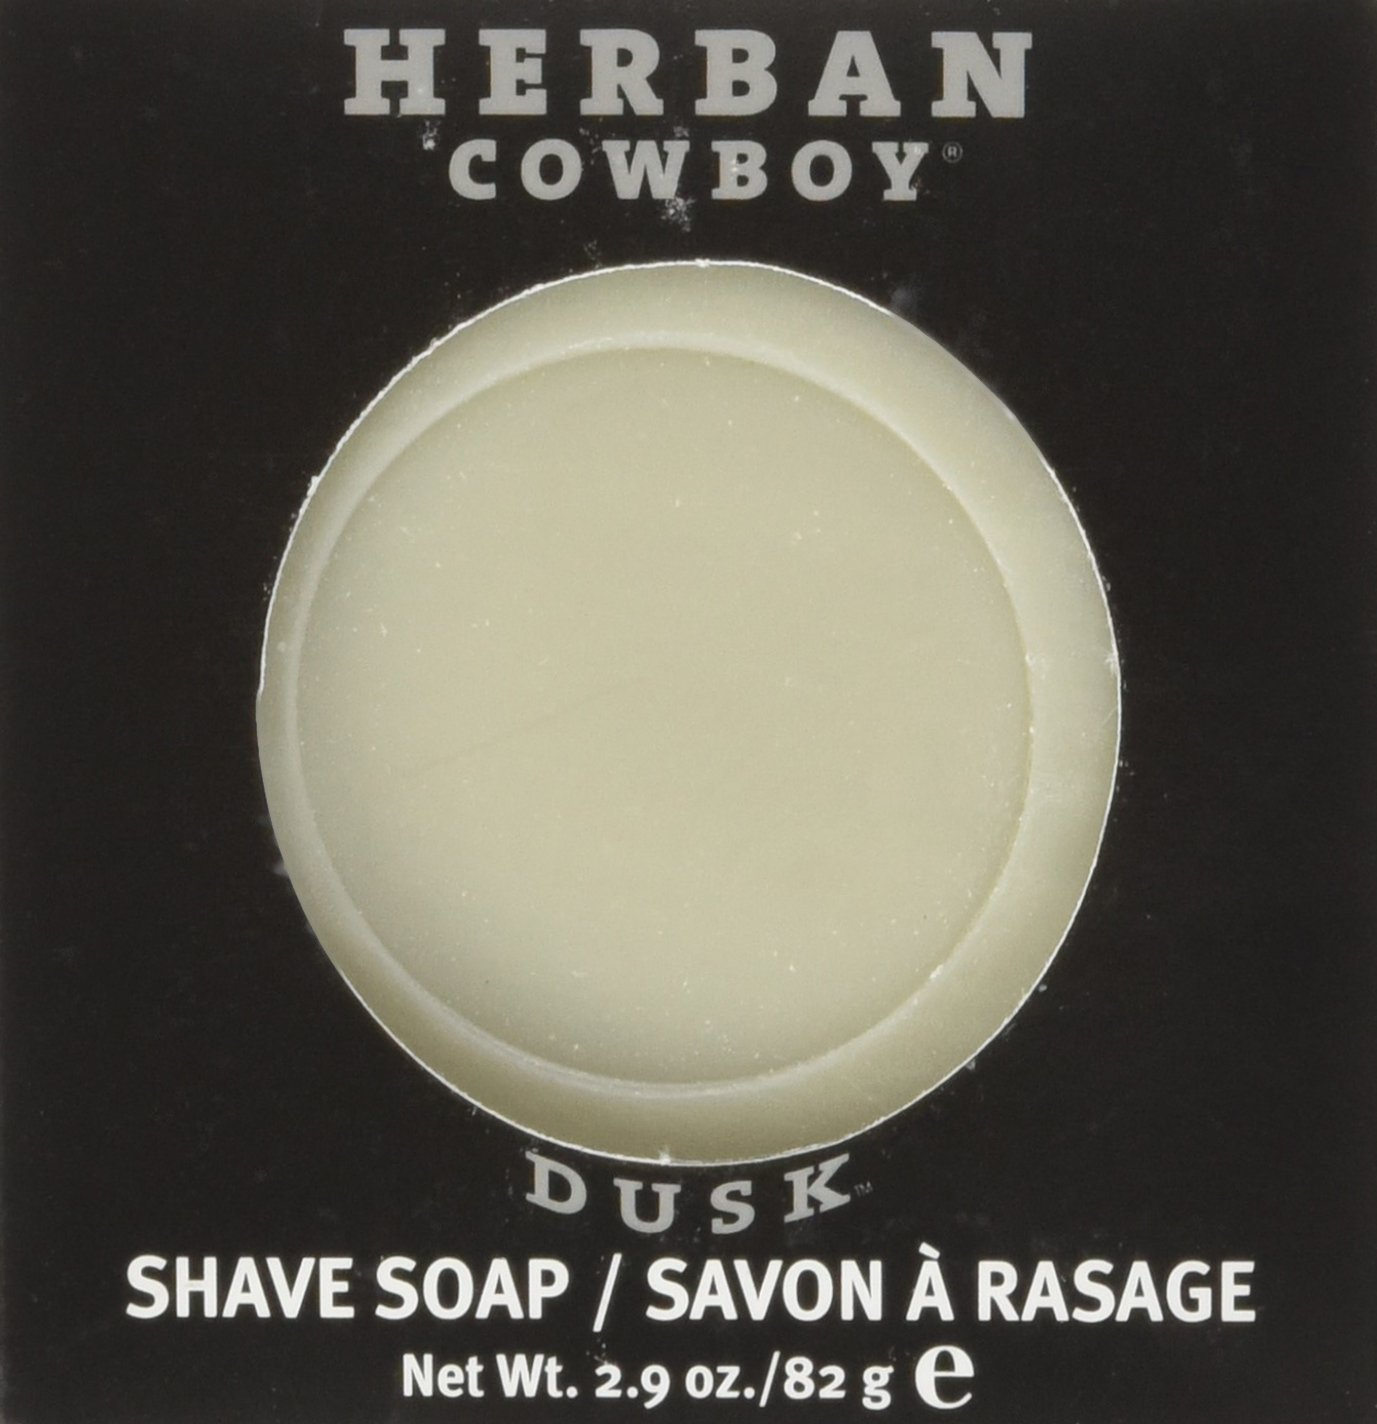 Herban Cowboy Dusk Shave Soap 86 ml UNFI - Select Nutrition 44